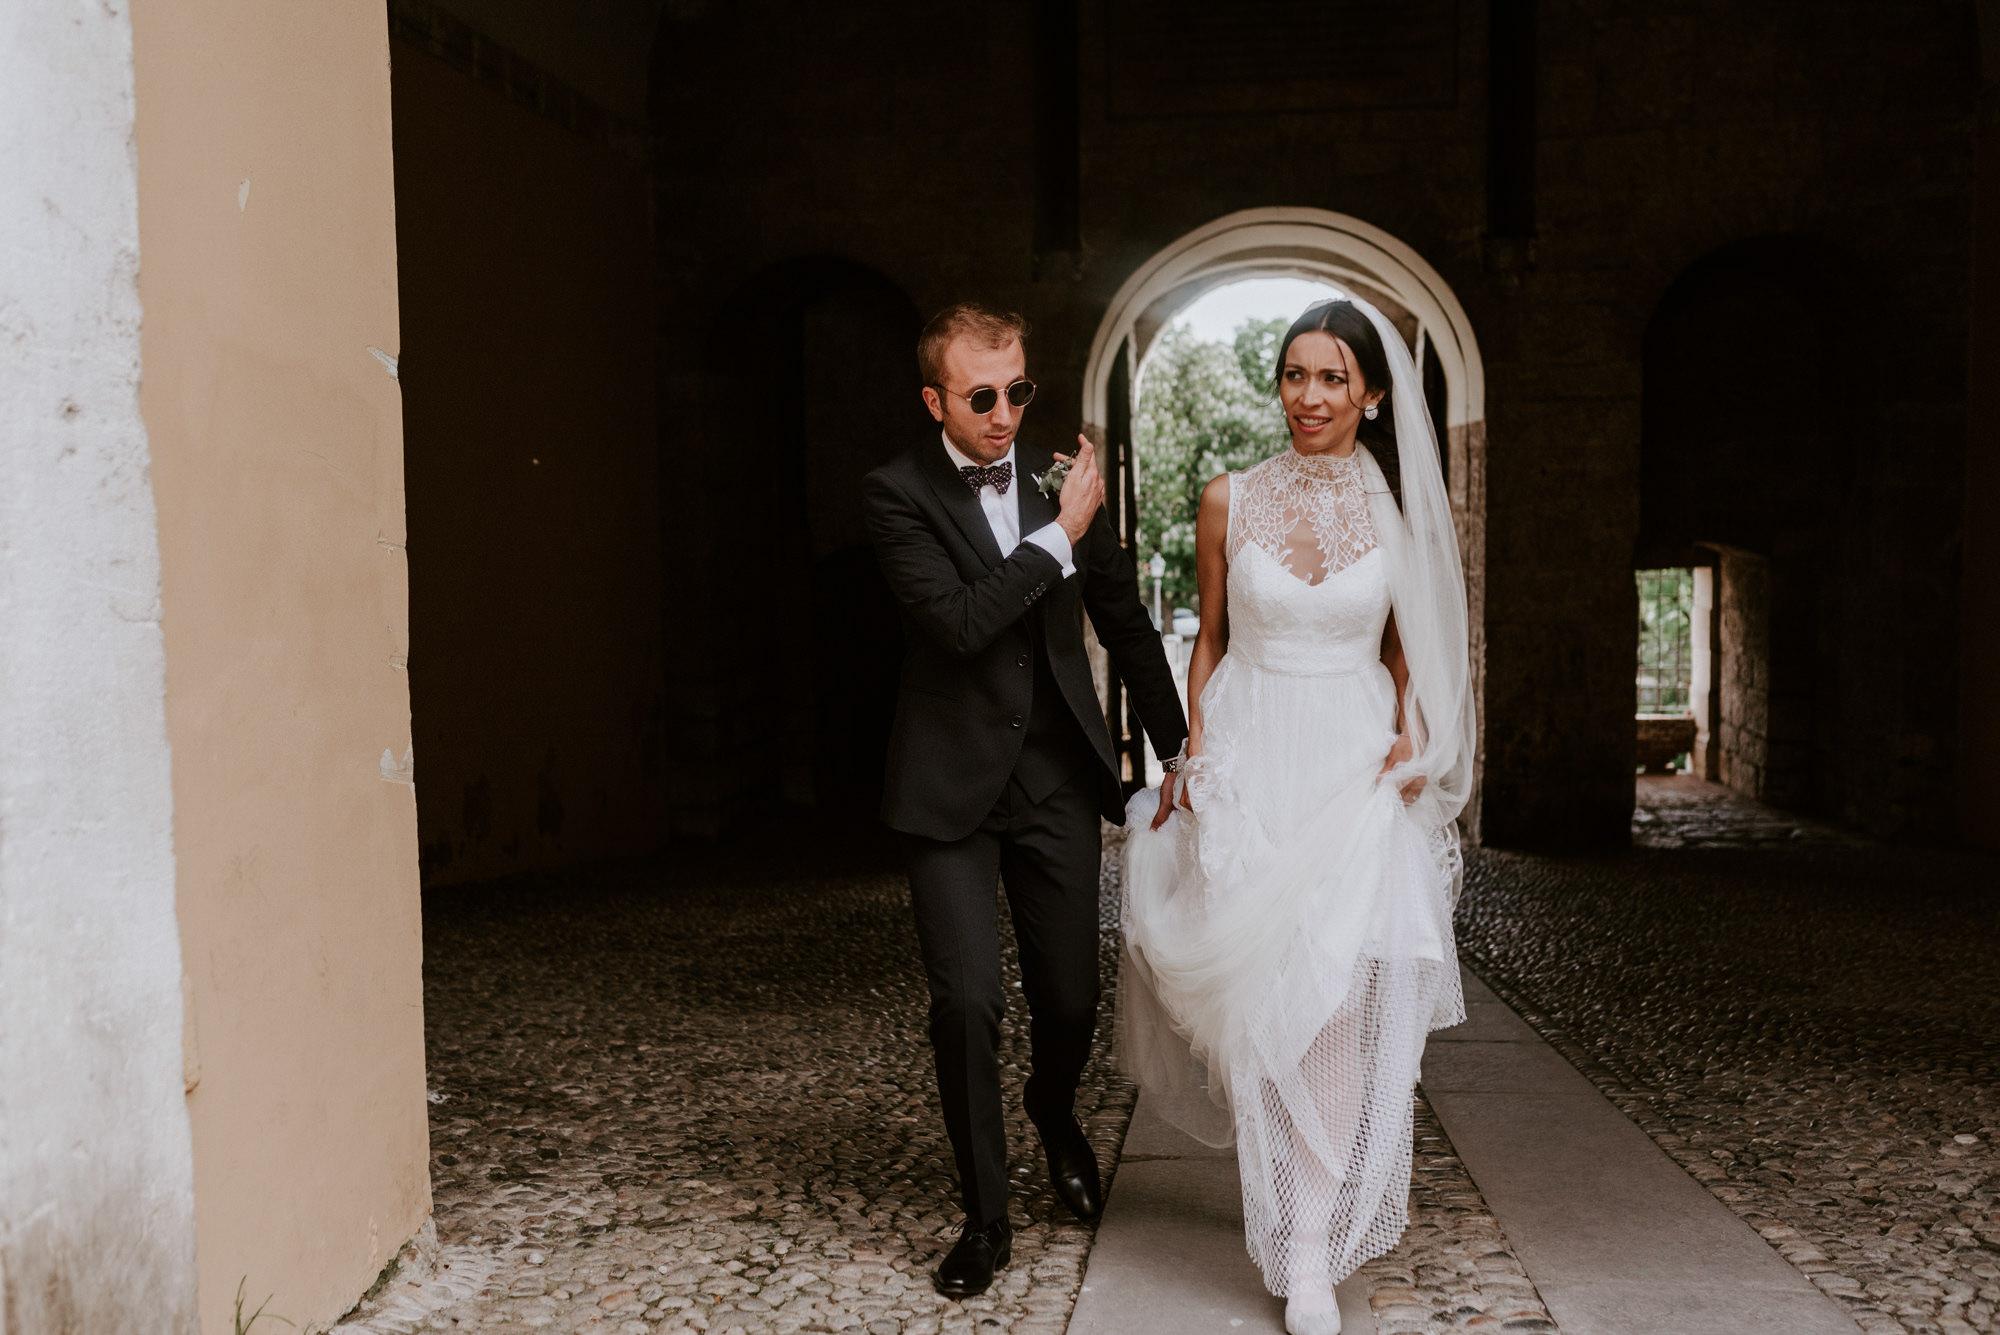 FOTO+PHOTO+BODA+WEDDING+ITALIA+ITALY+MAURICIO+GARAY+MAURICIOGARAY+WEDDINPHOTOGRAPHER+FOTOGRAFODEBODA-1159.jpg